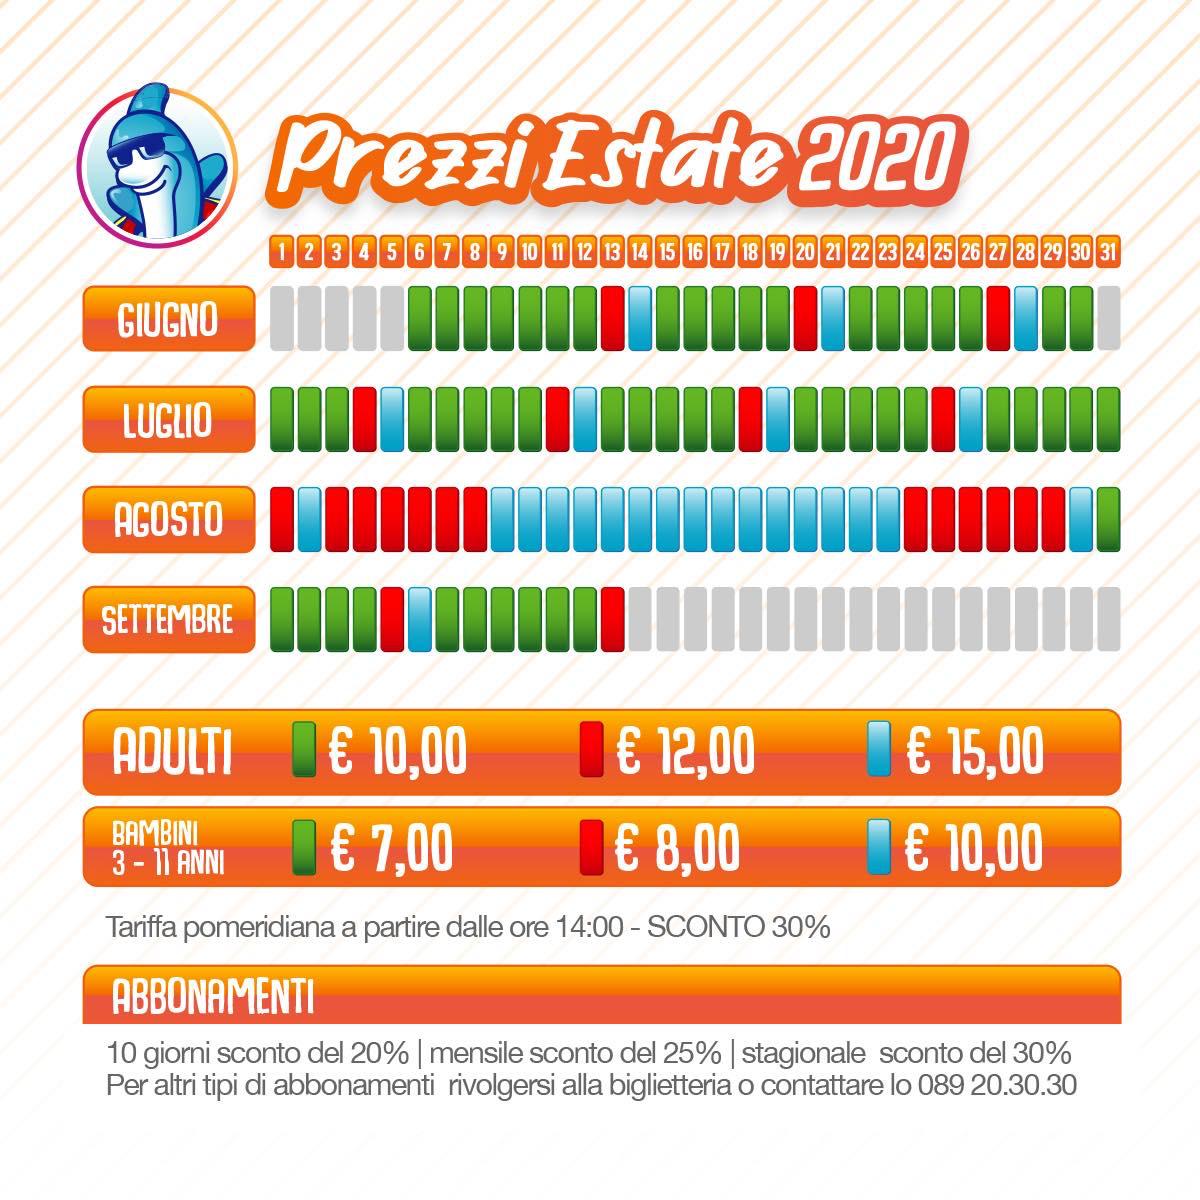 LISTINO-PREZZI-ESTATE-2020